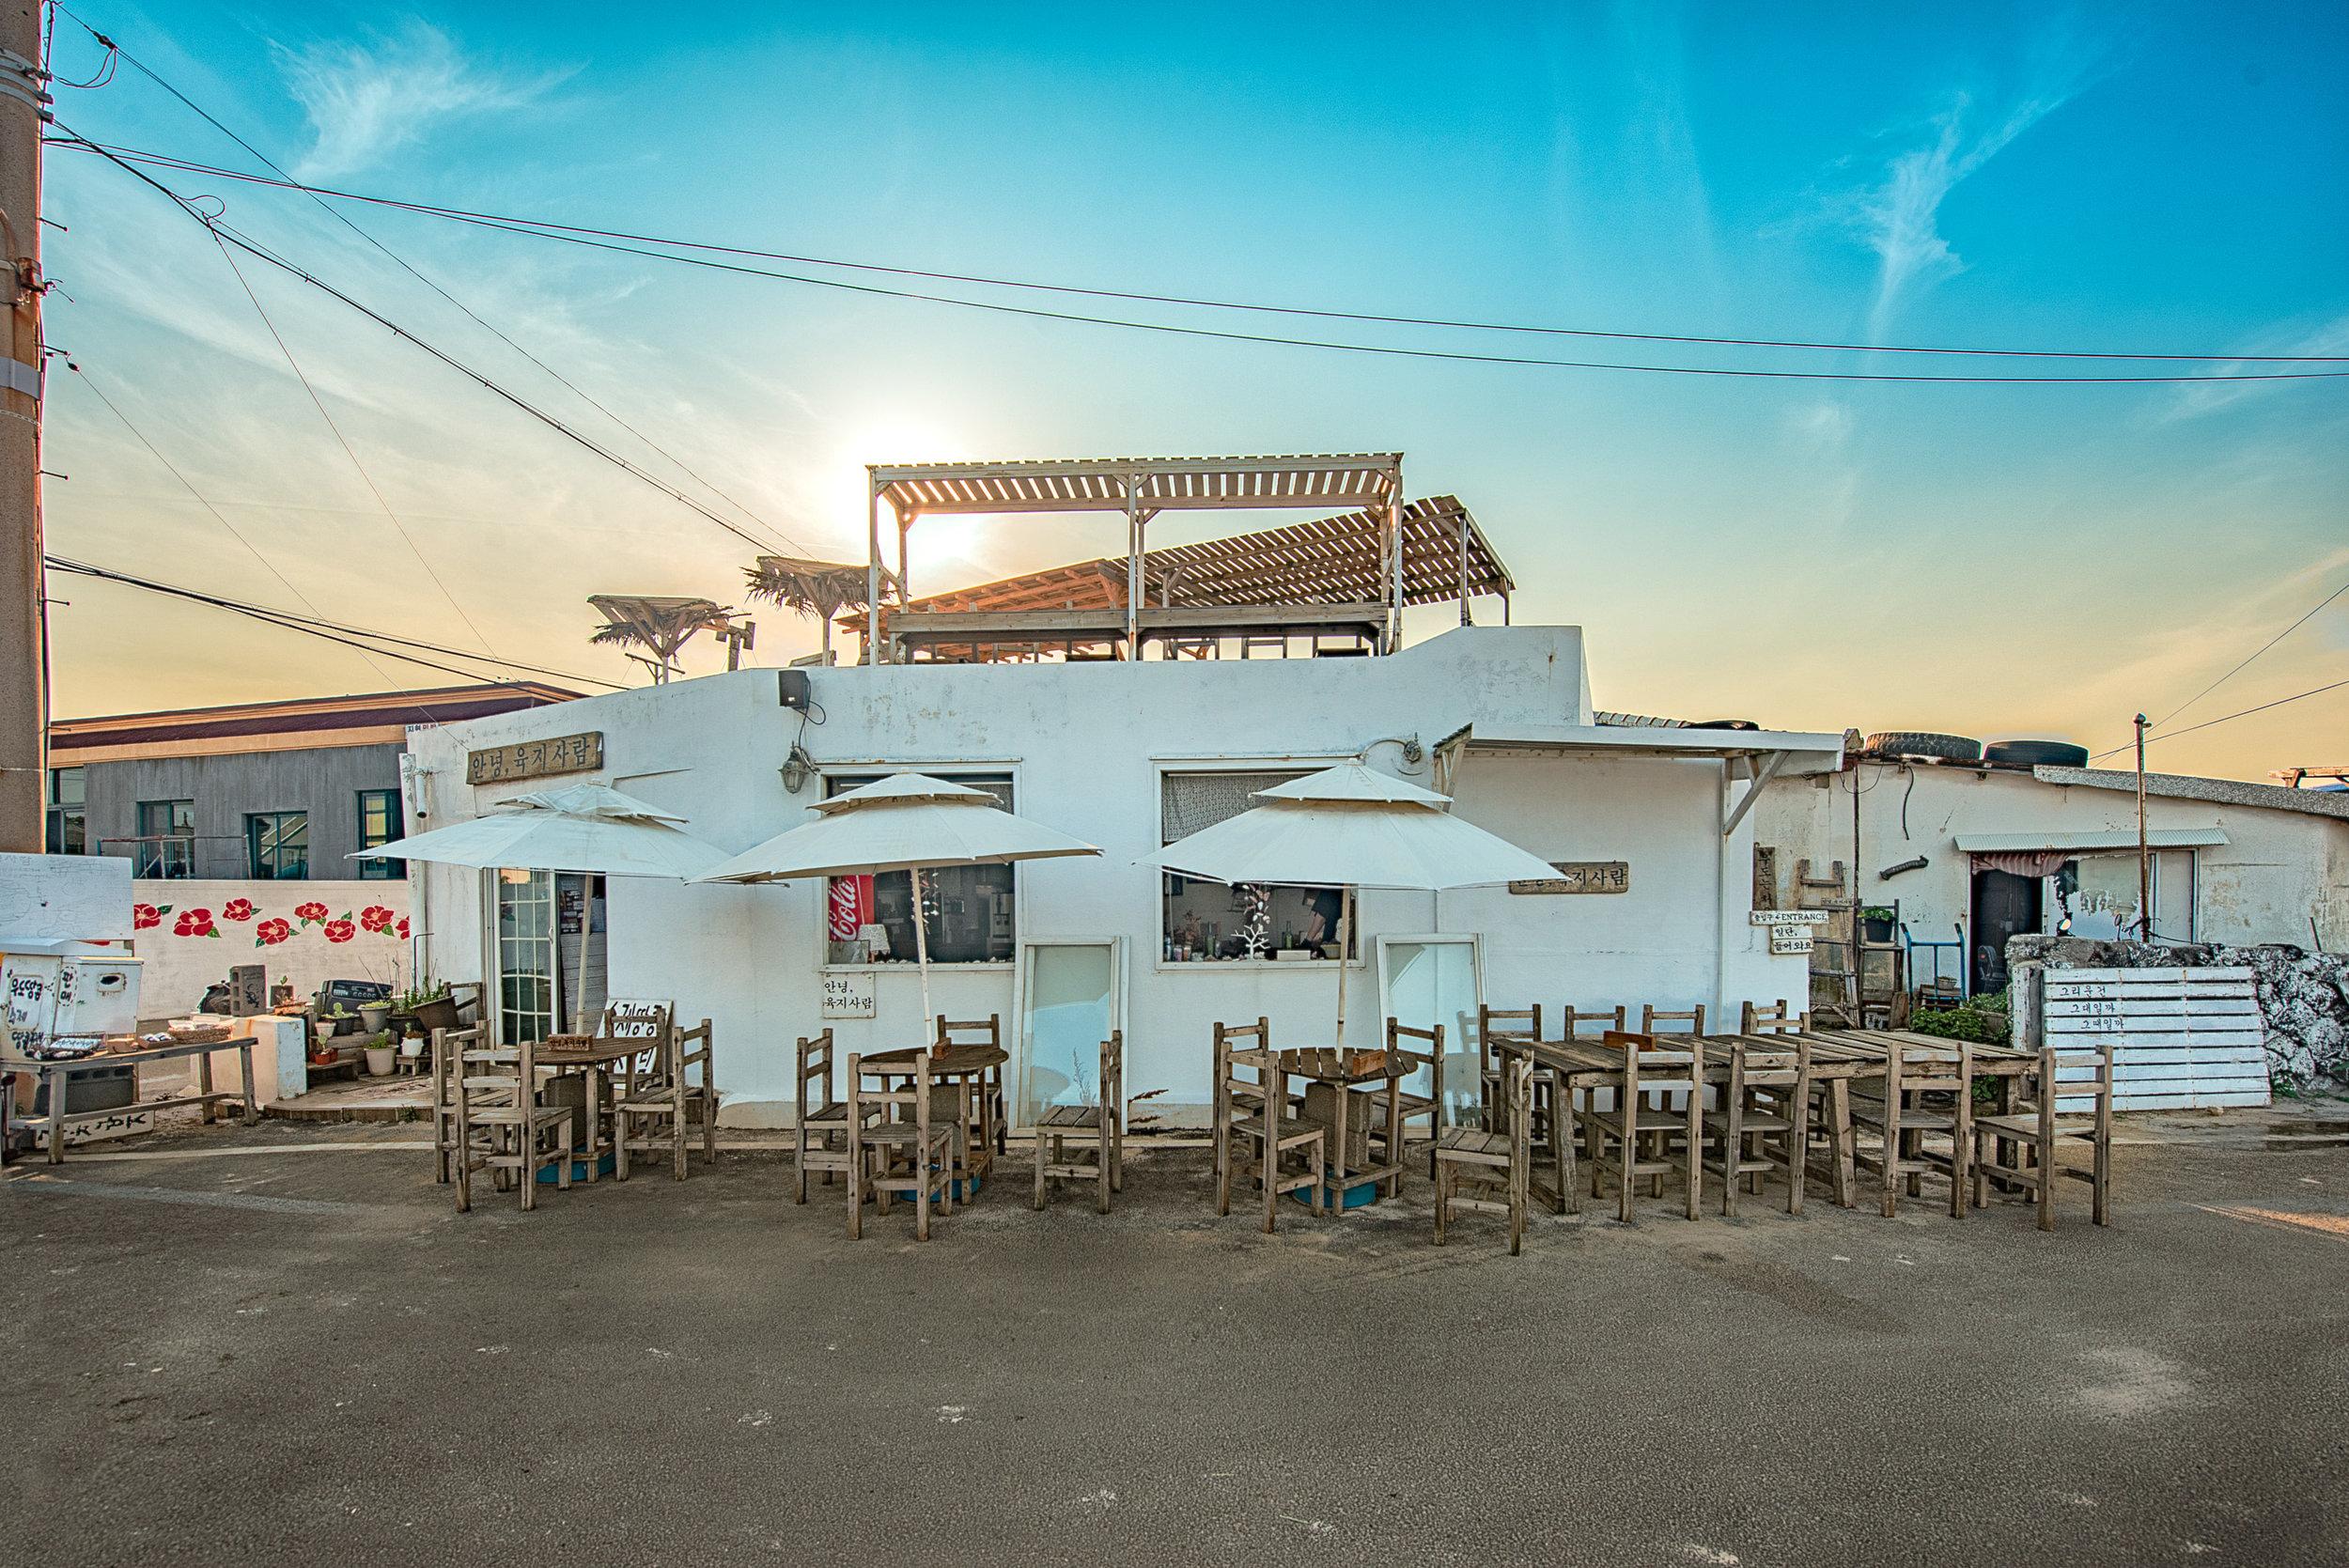 My friend Yoon's beach front cafe, 2019 (안녕 육지 사람, Hello Land People)